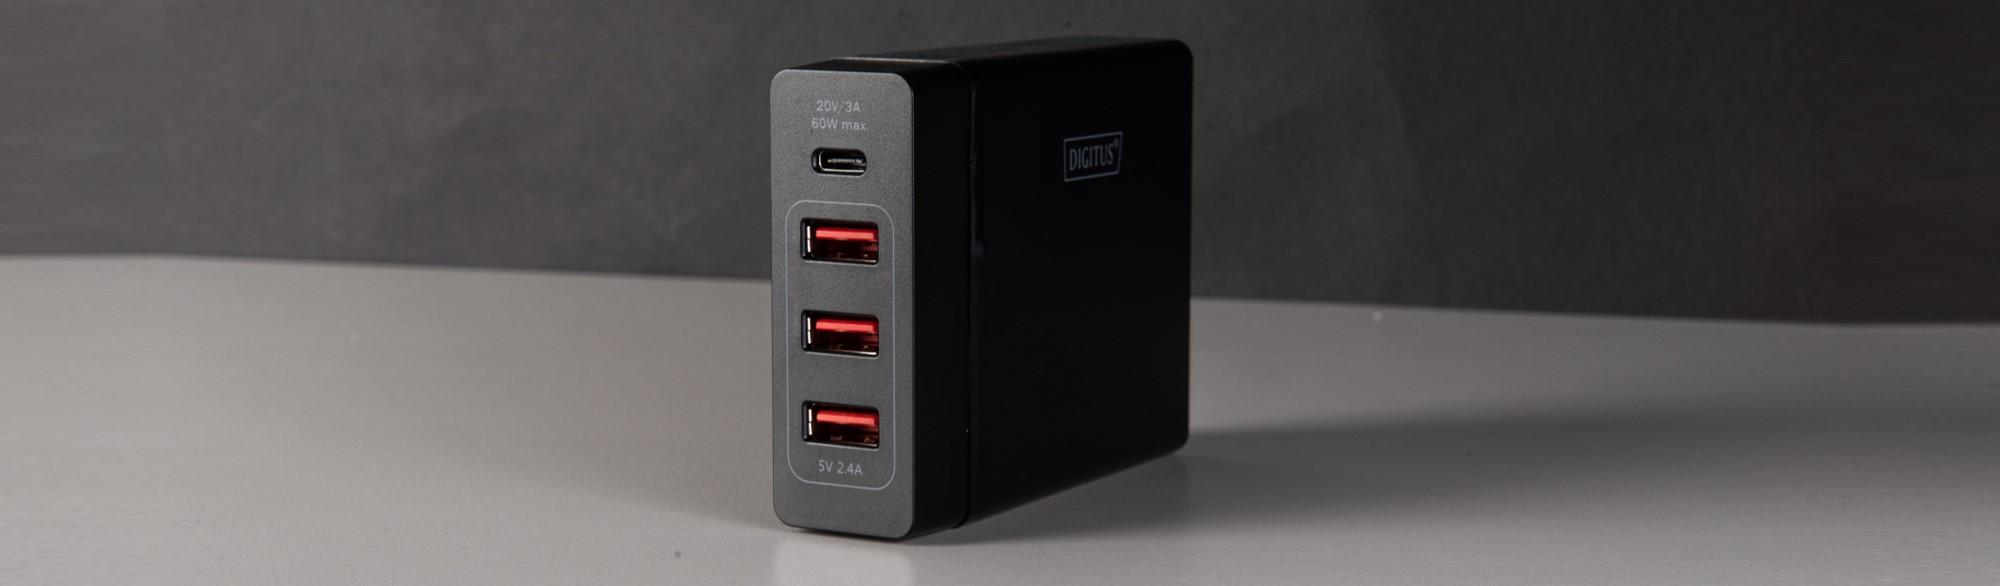 Adapter ładowania USB